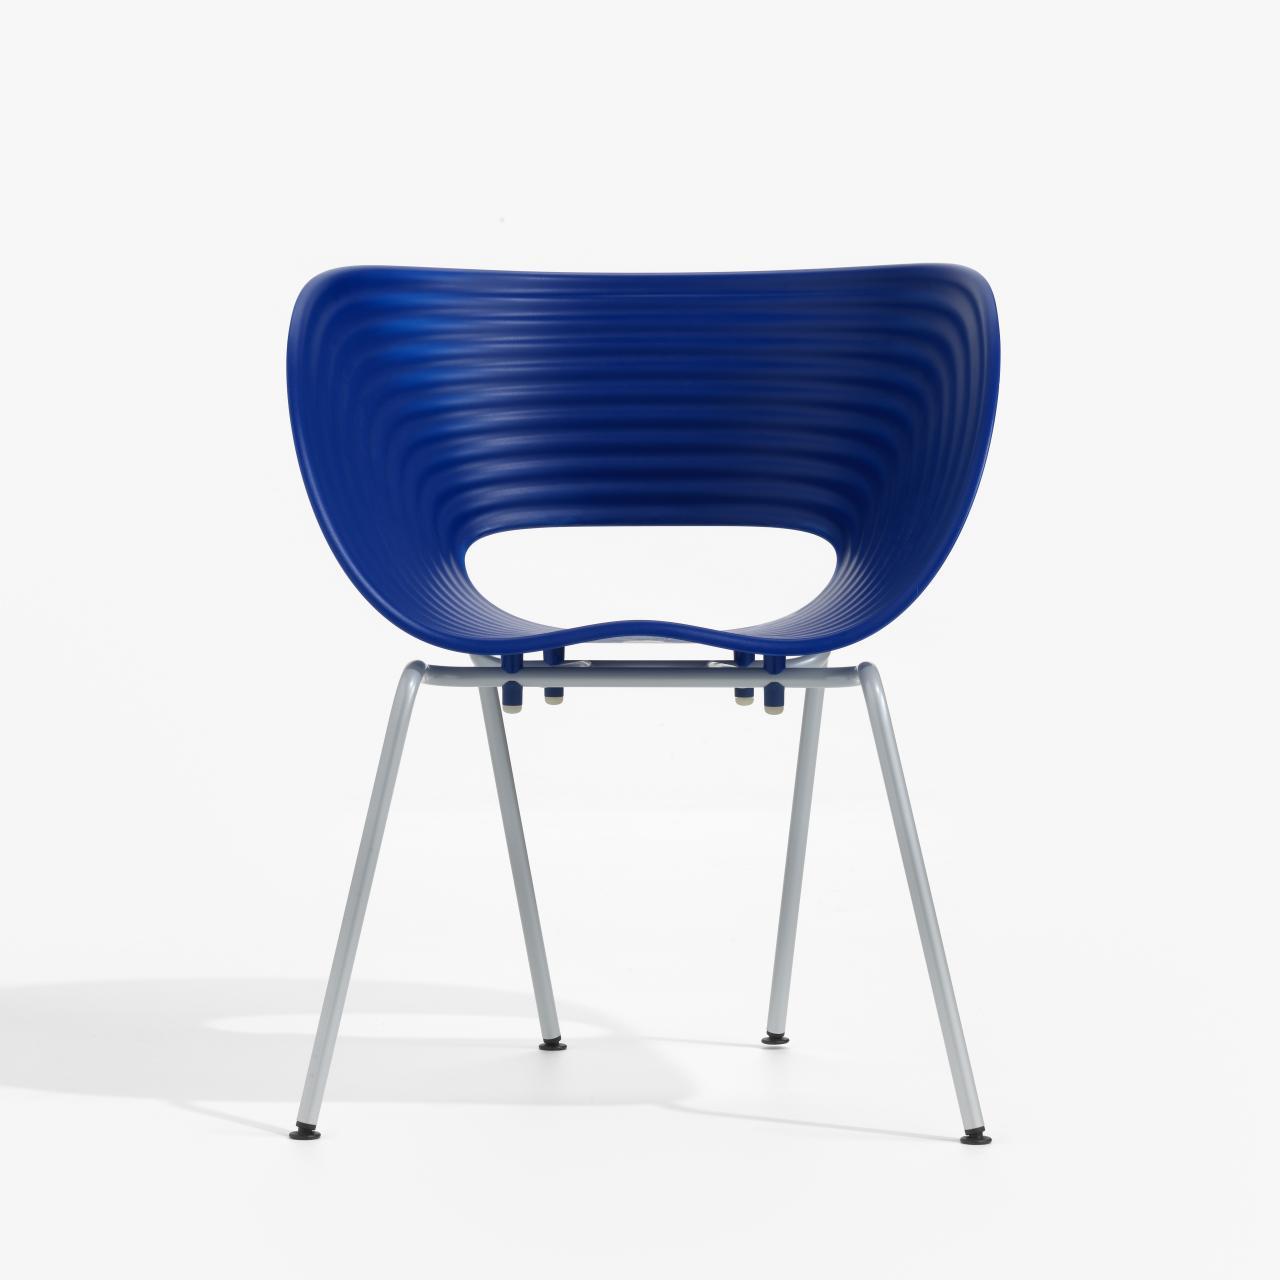 tom vac chair ron arad designer vitra weil am rhein manufacturer ngv view work. Black Bedroom Furniture Sets. Home Design Ideas